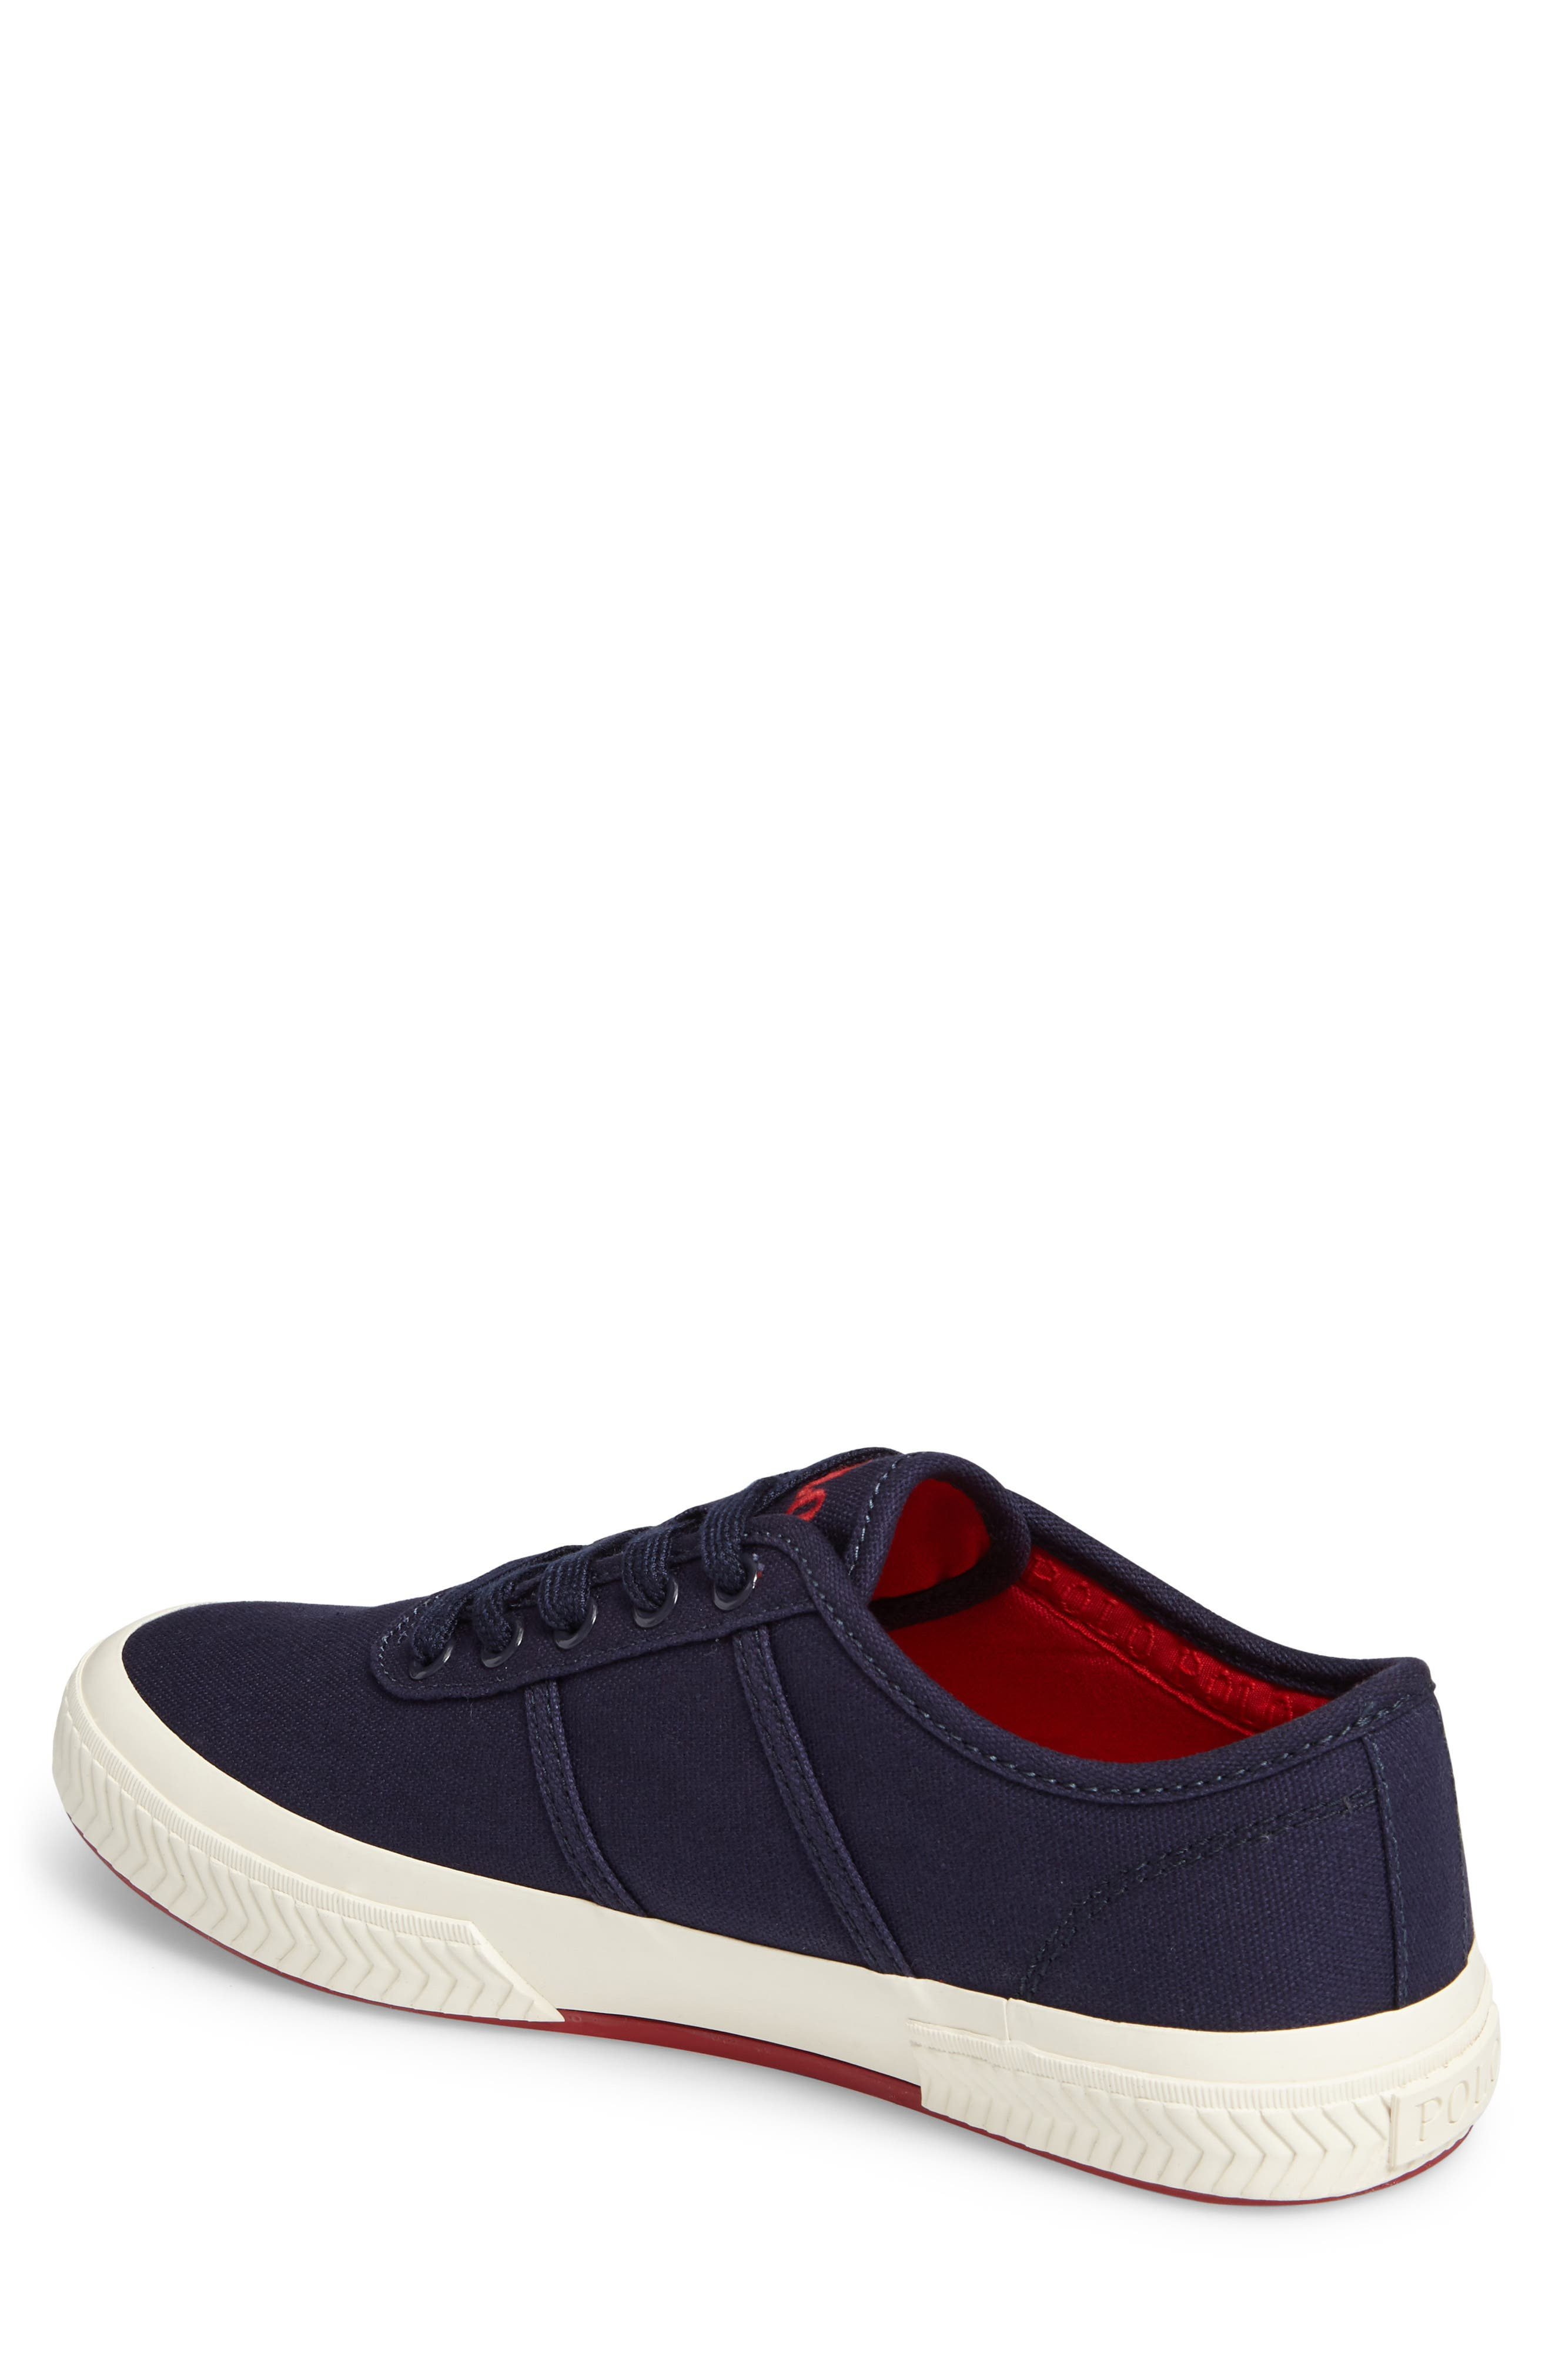 Polo Ralph Lauren Tyrian Sneaker,                             Alternate thumbnail 2, color,                             Newport Navy